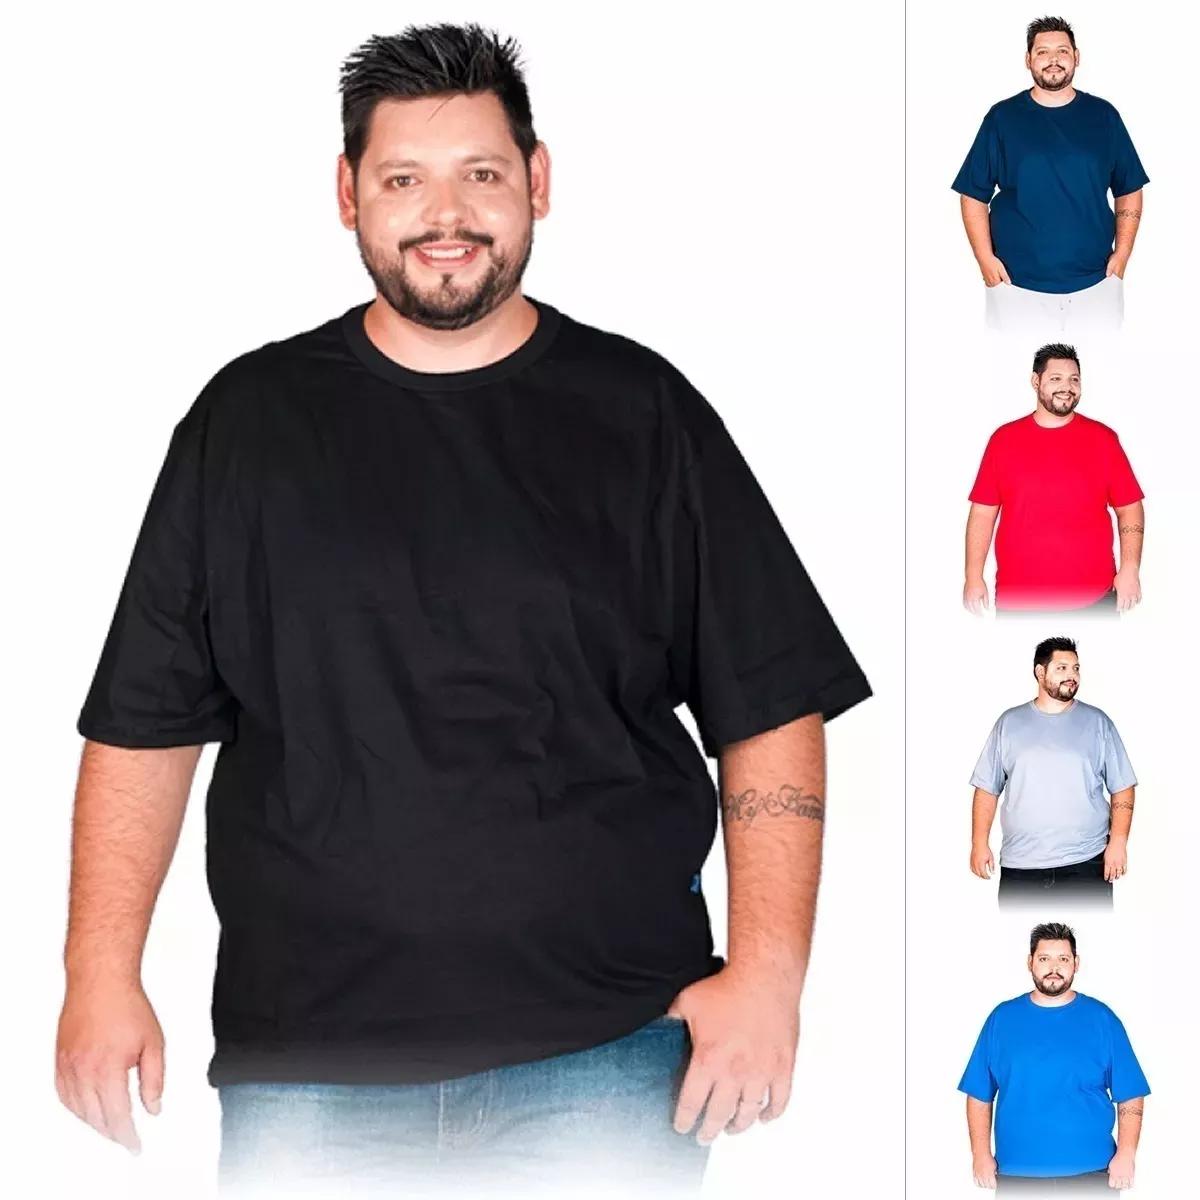 077a34fda Camiseta Plus Size Masculina Xg G1 G2 G3 Extra Grande Blusa no Elo7 ...